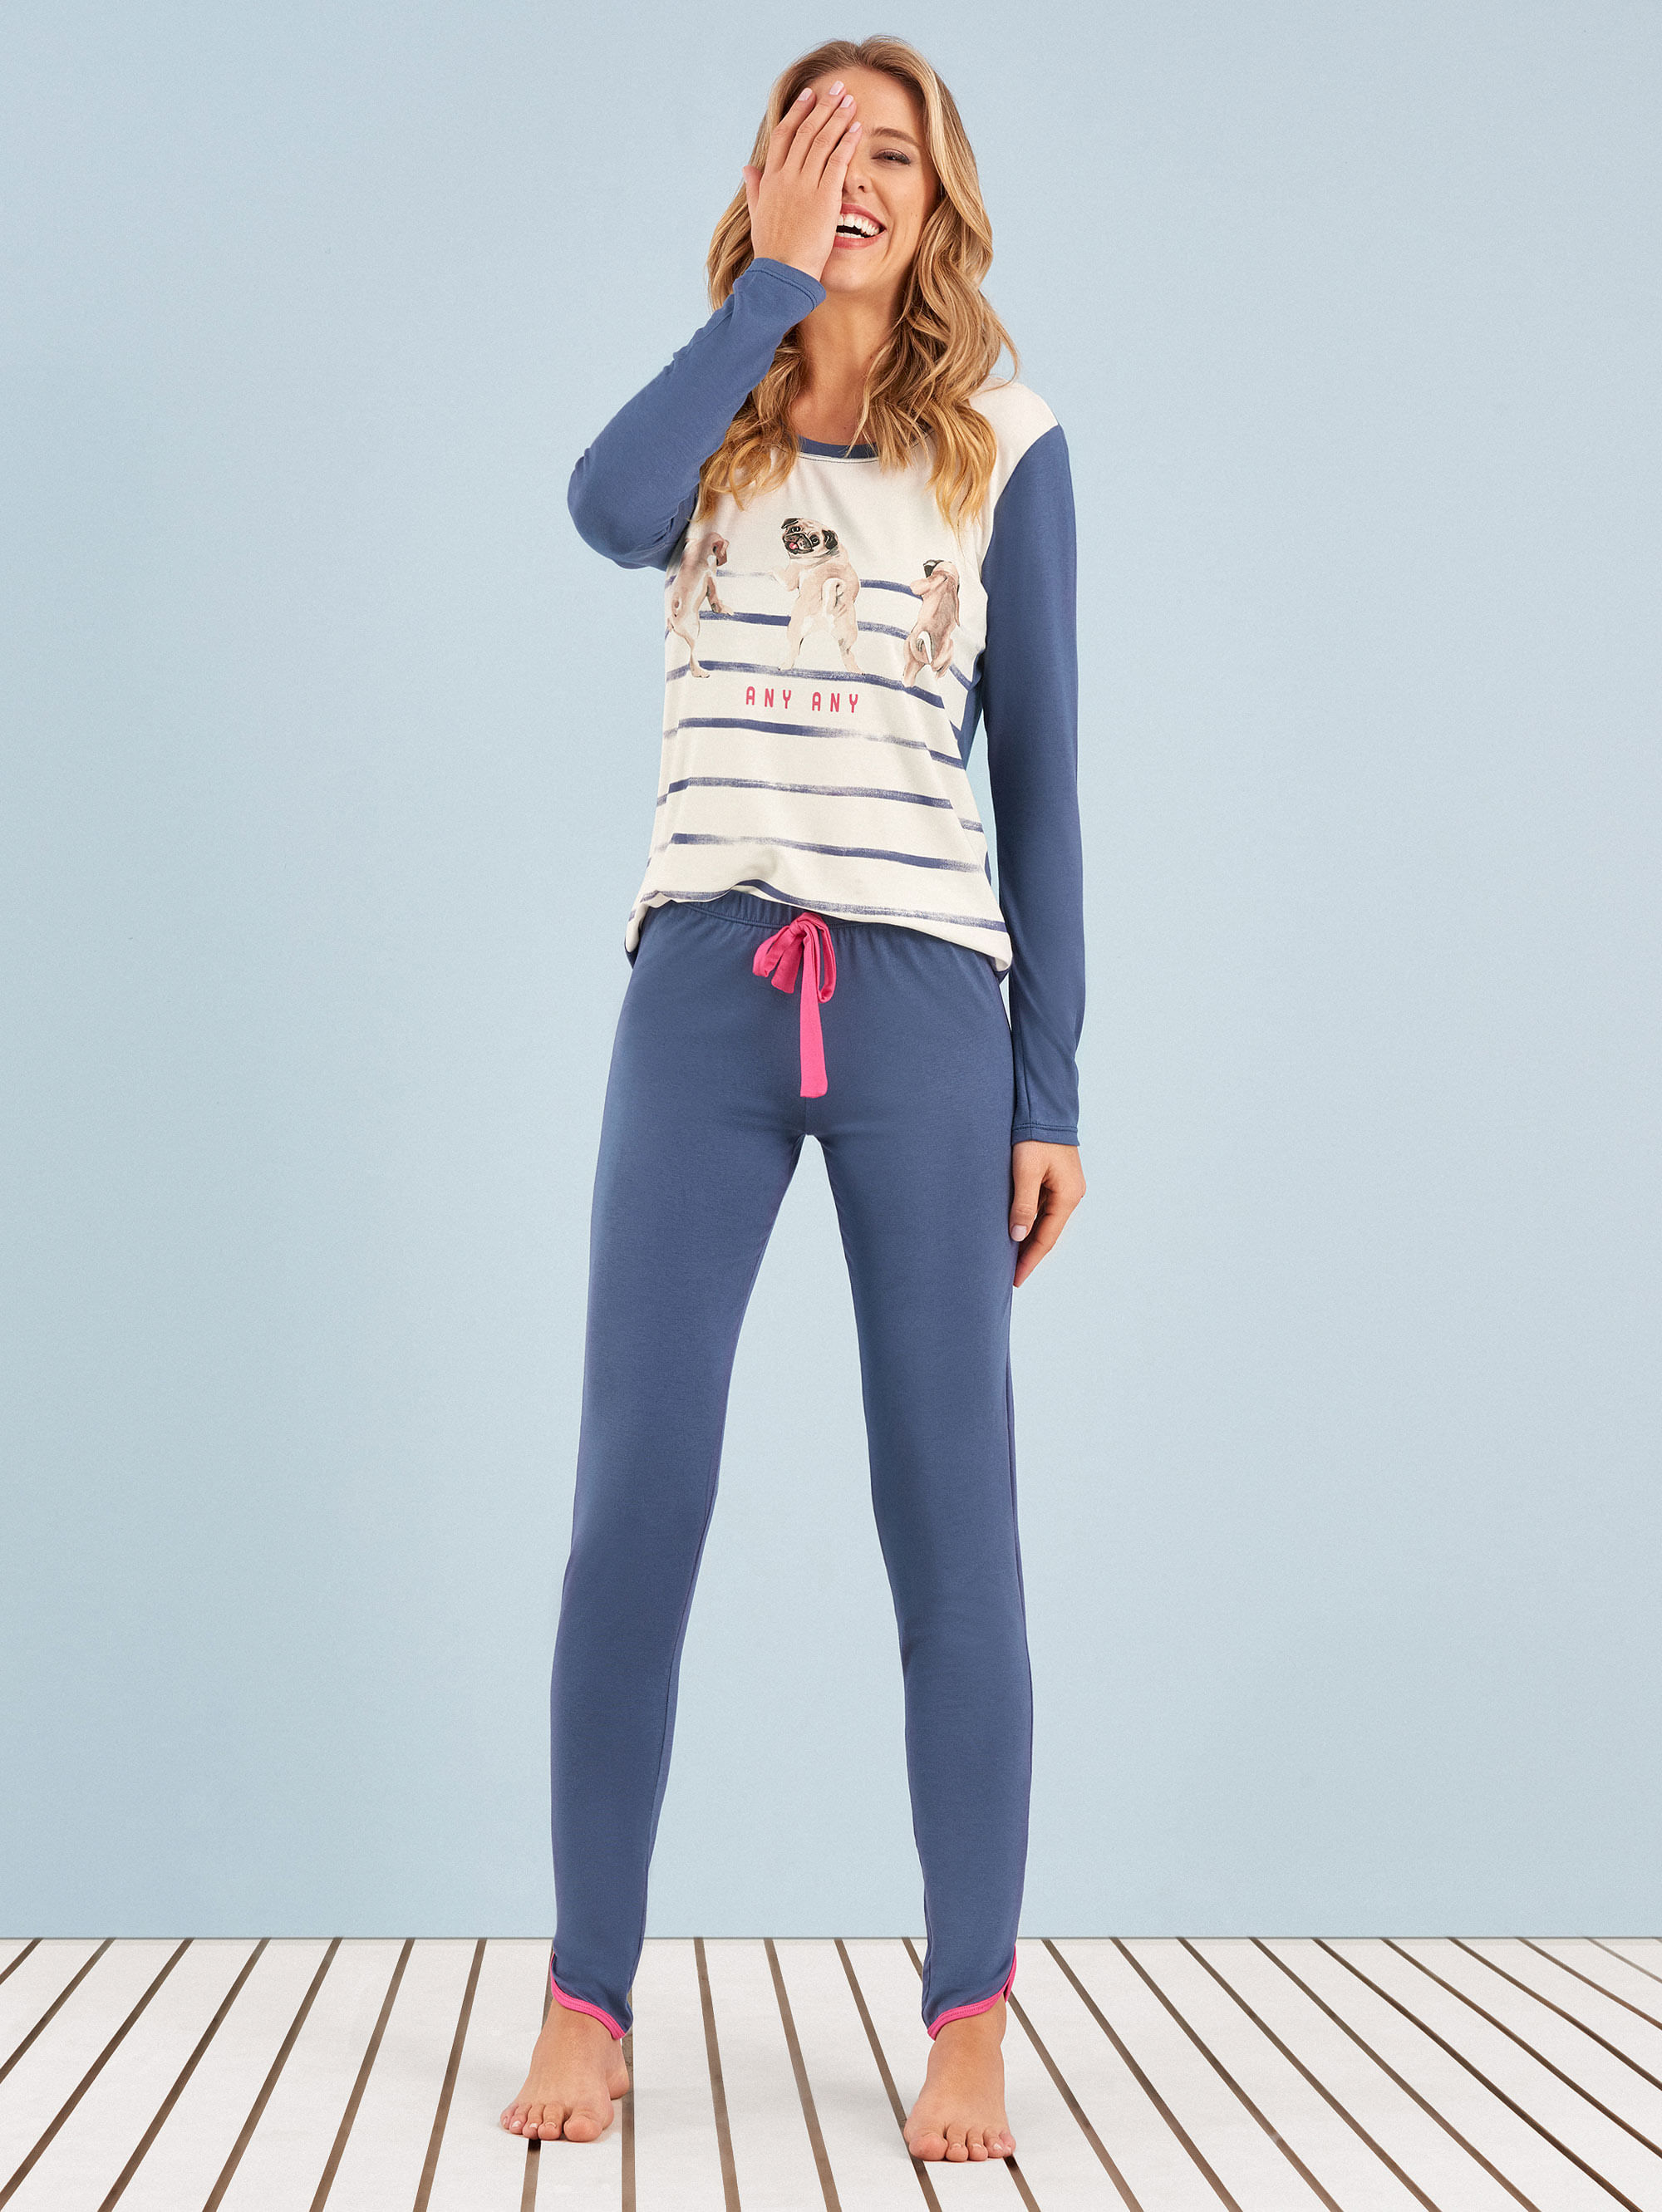 Pijama-Longo-Manga-Longa-Pug-Stripe-Any-Any